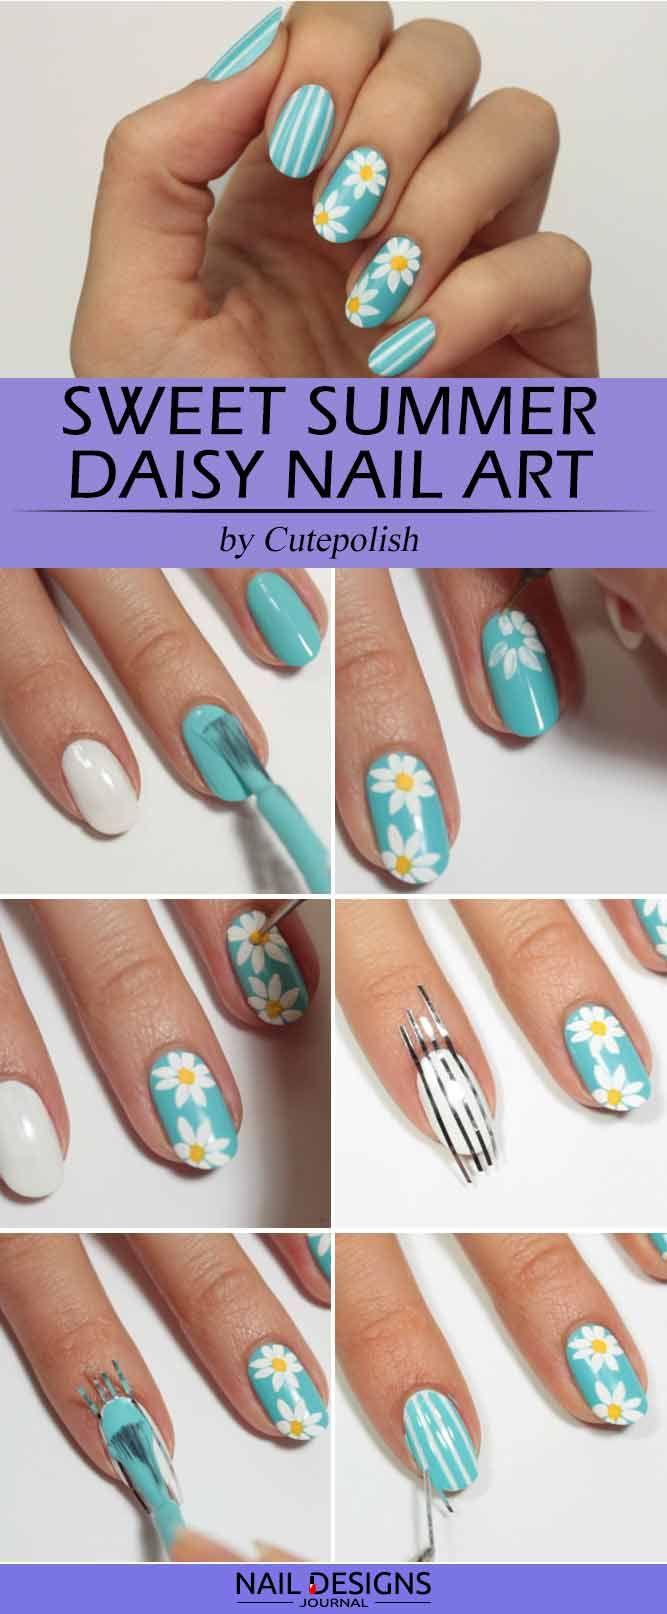 Diy Nails Guide To Perfect At Home Manicure Naildesignsjournal Com Diy Nail Designs Diy Nails Easy Daisy Nail Art